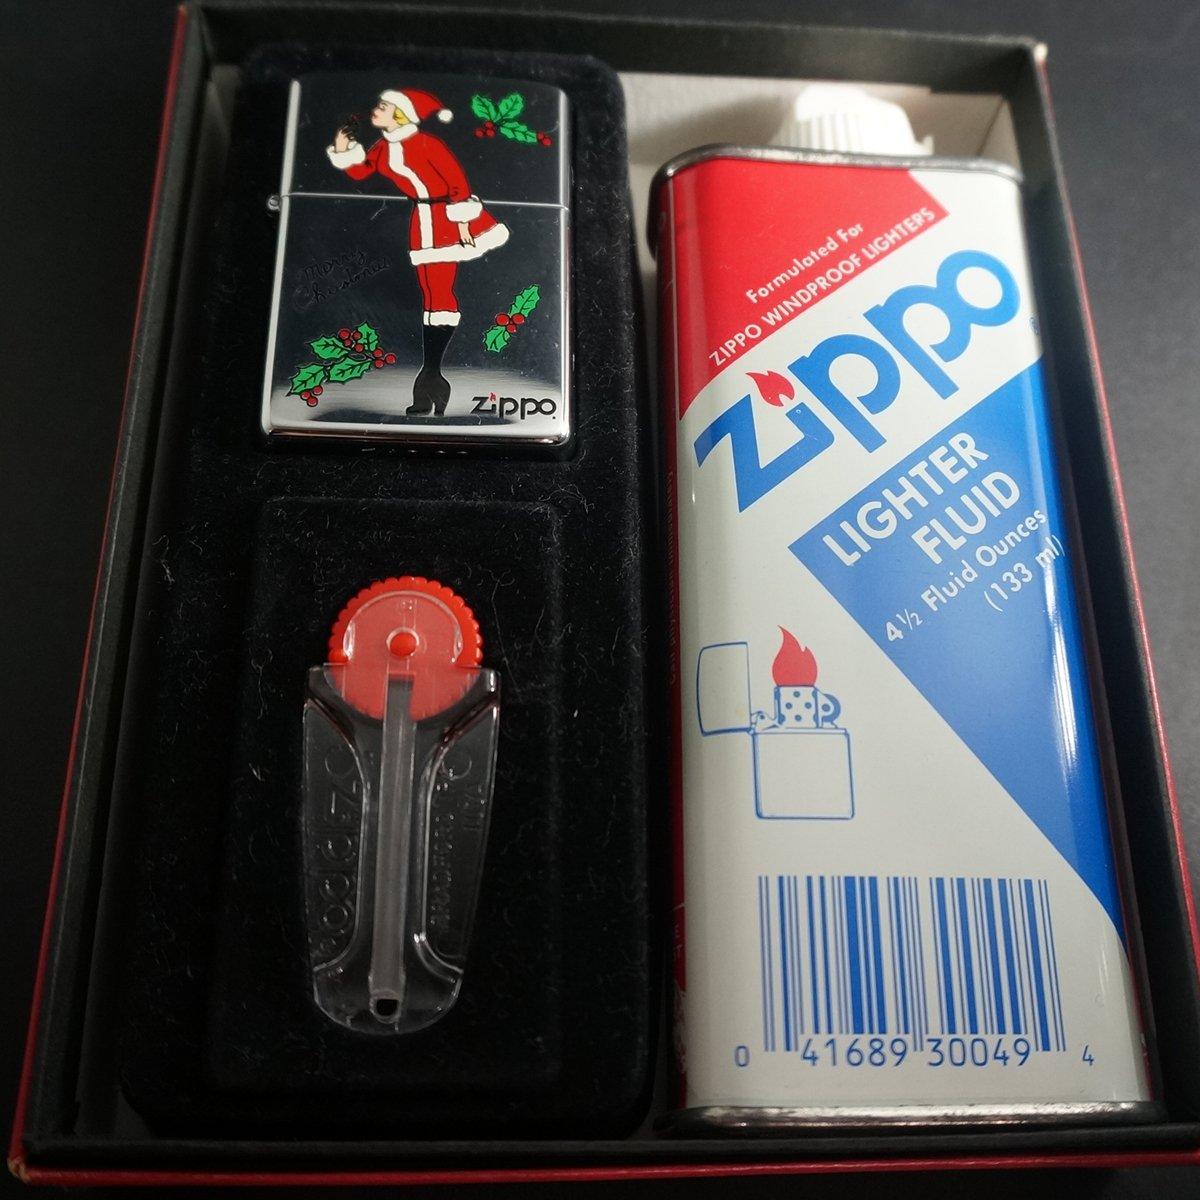 zippo WINDY クリスマスガール ギフトBOXセット1994年製造 B076LXSSH7